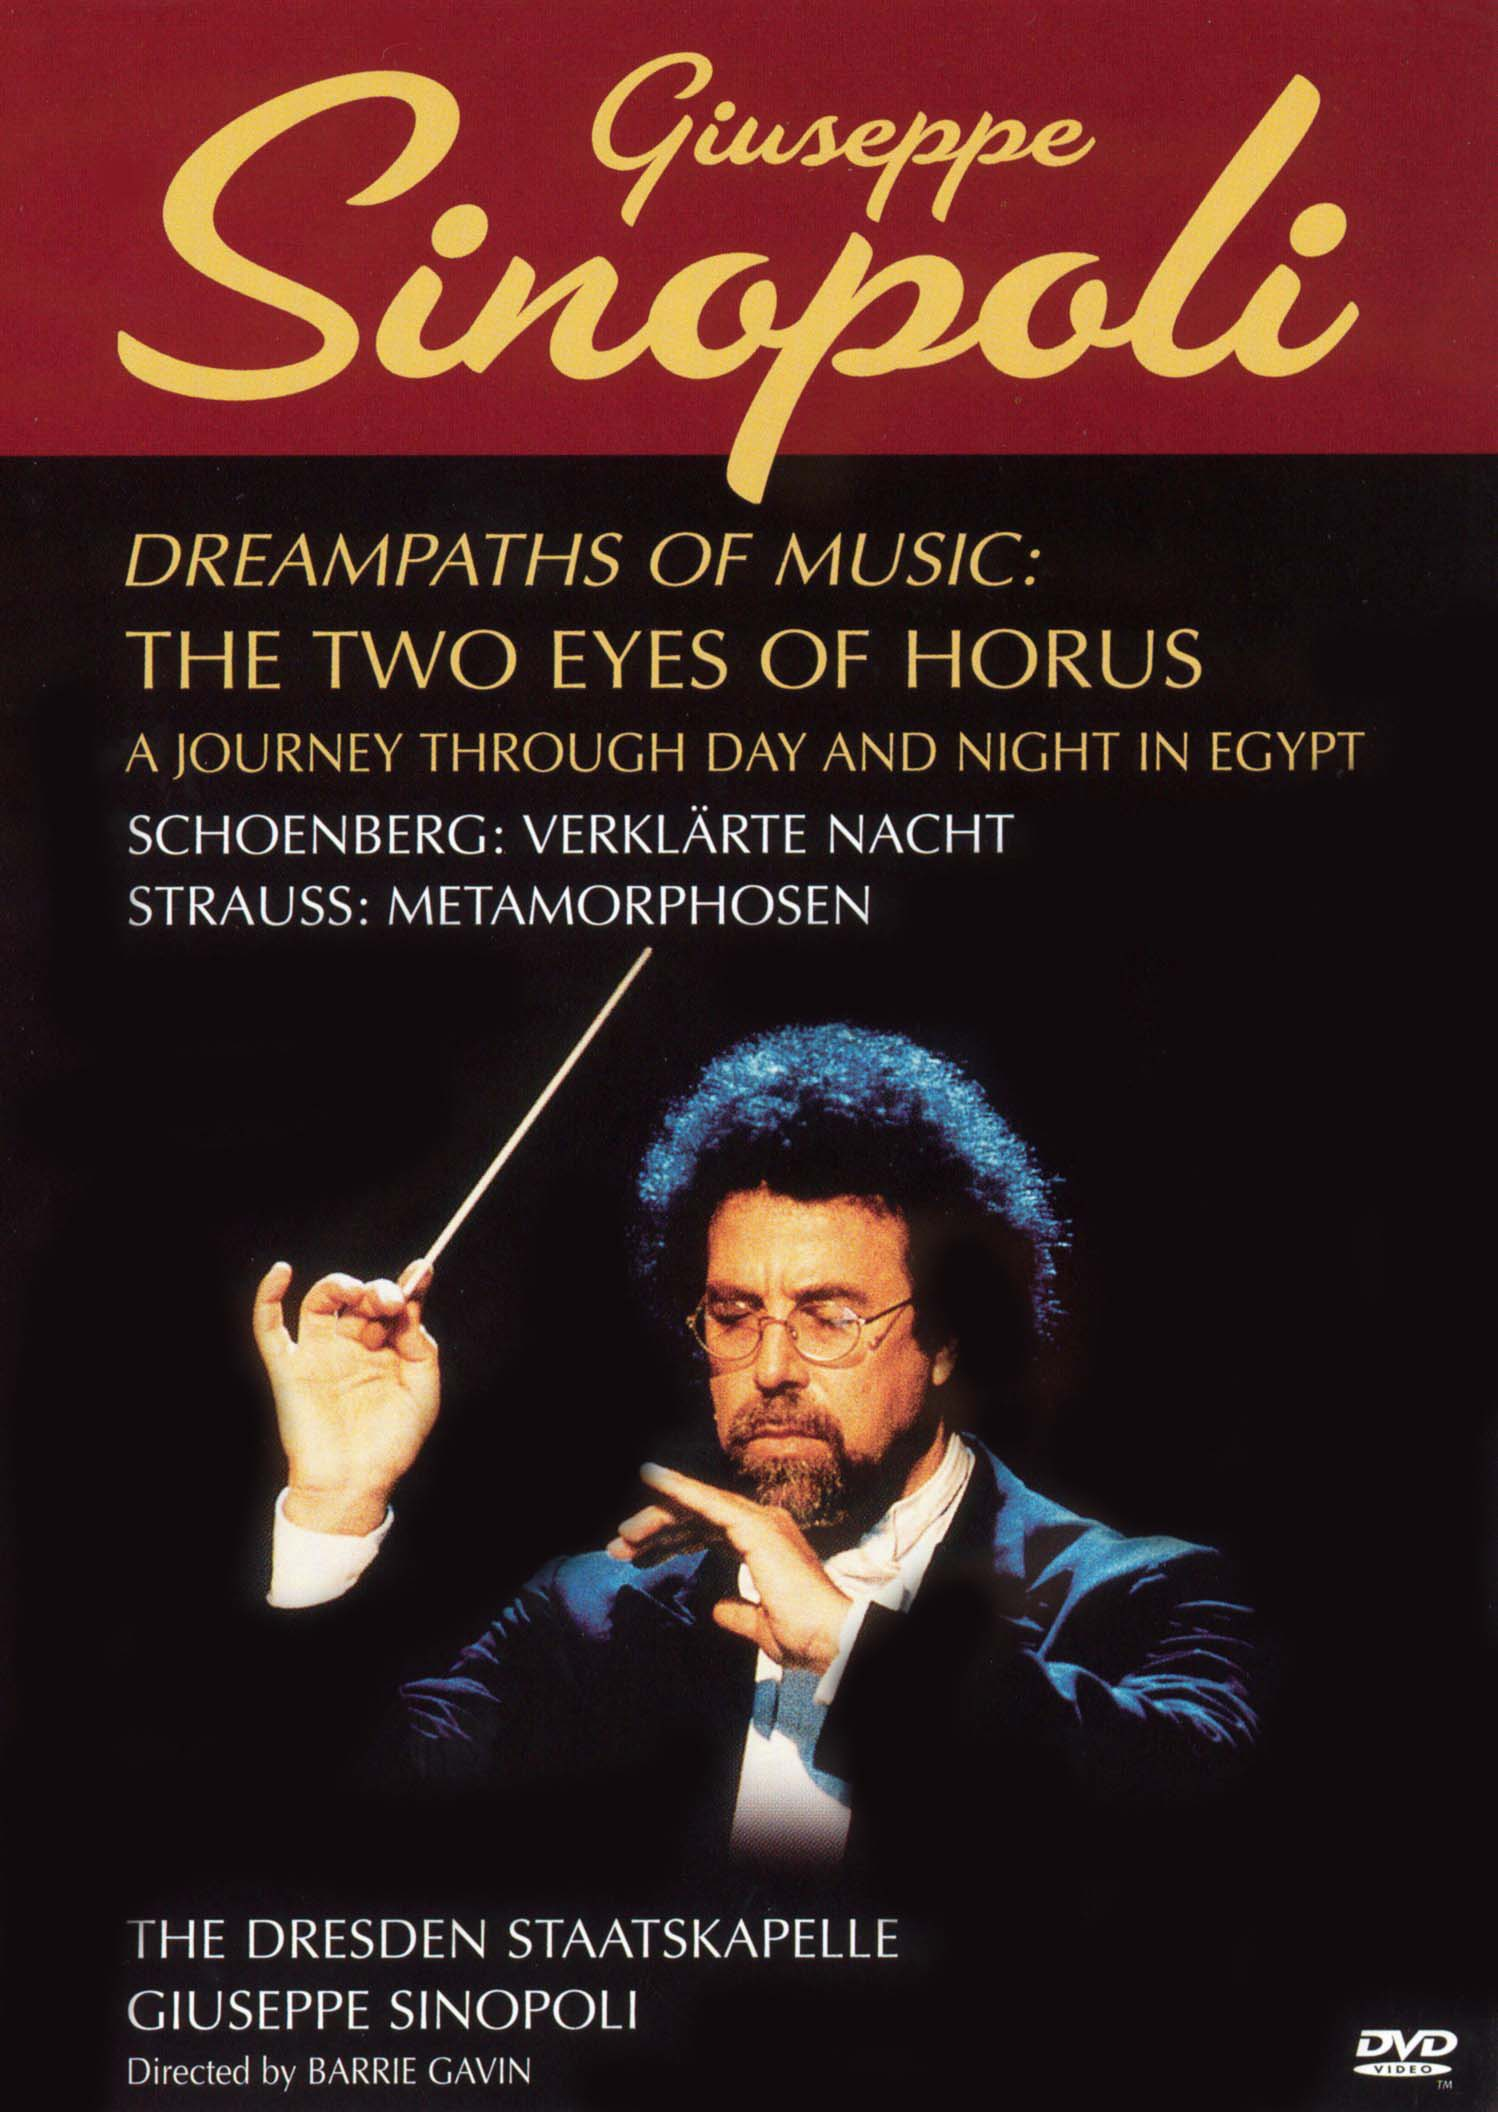 Giuseppe Sinopoli: Dreampaths of Music - The Two Eyes of Horus